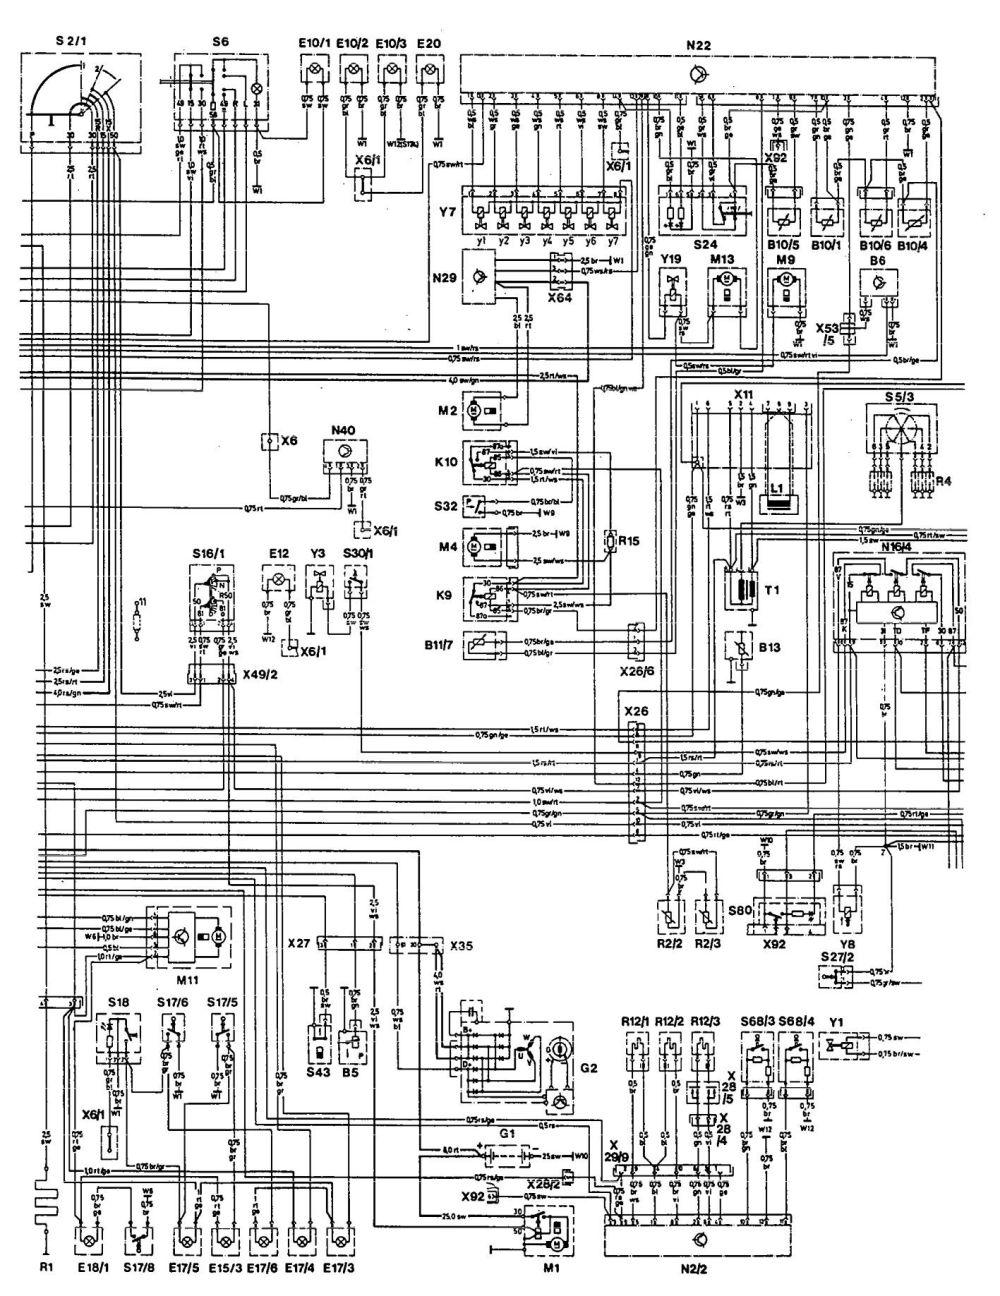 medium resolution of 1991 mercedes 300e fuse box 1991 mercedes e300 wiring 91 mercedes 190e fuse box auto electrical wiring diagram